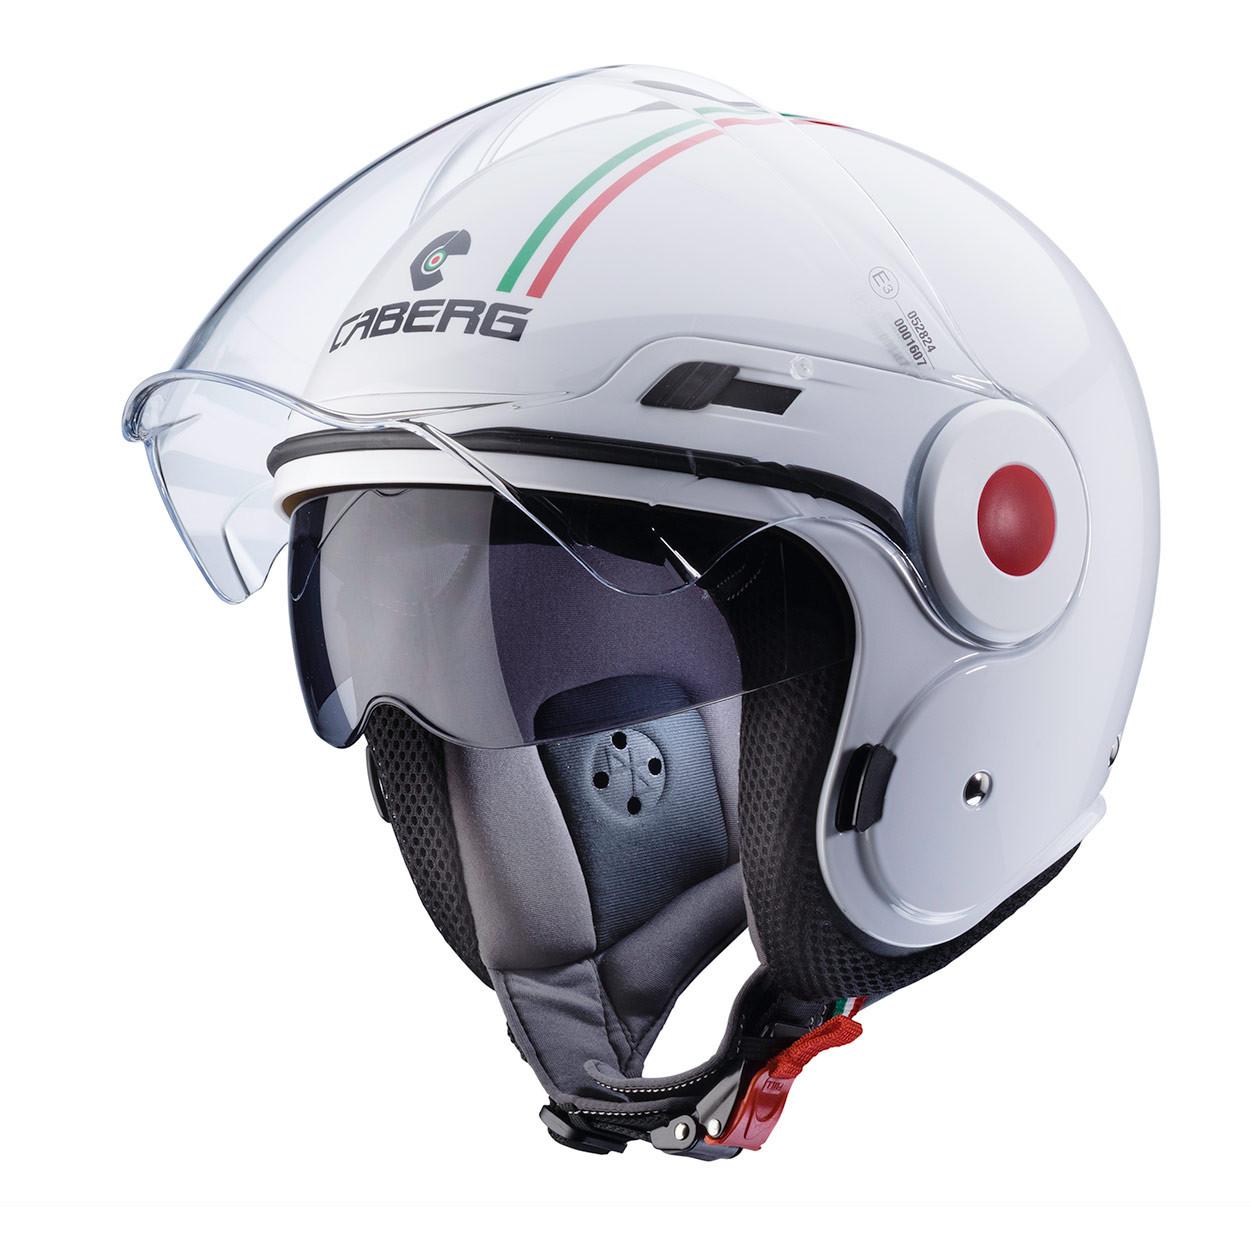 XL CASCO CABERG JET DOPPIA VISIERA SCOOTER MOTO UPTOWN ITALIA BIANCO TG